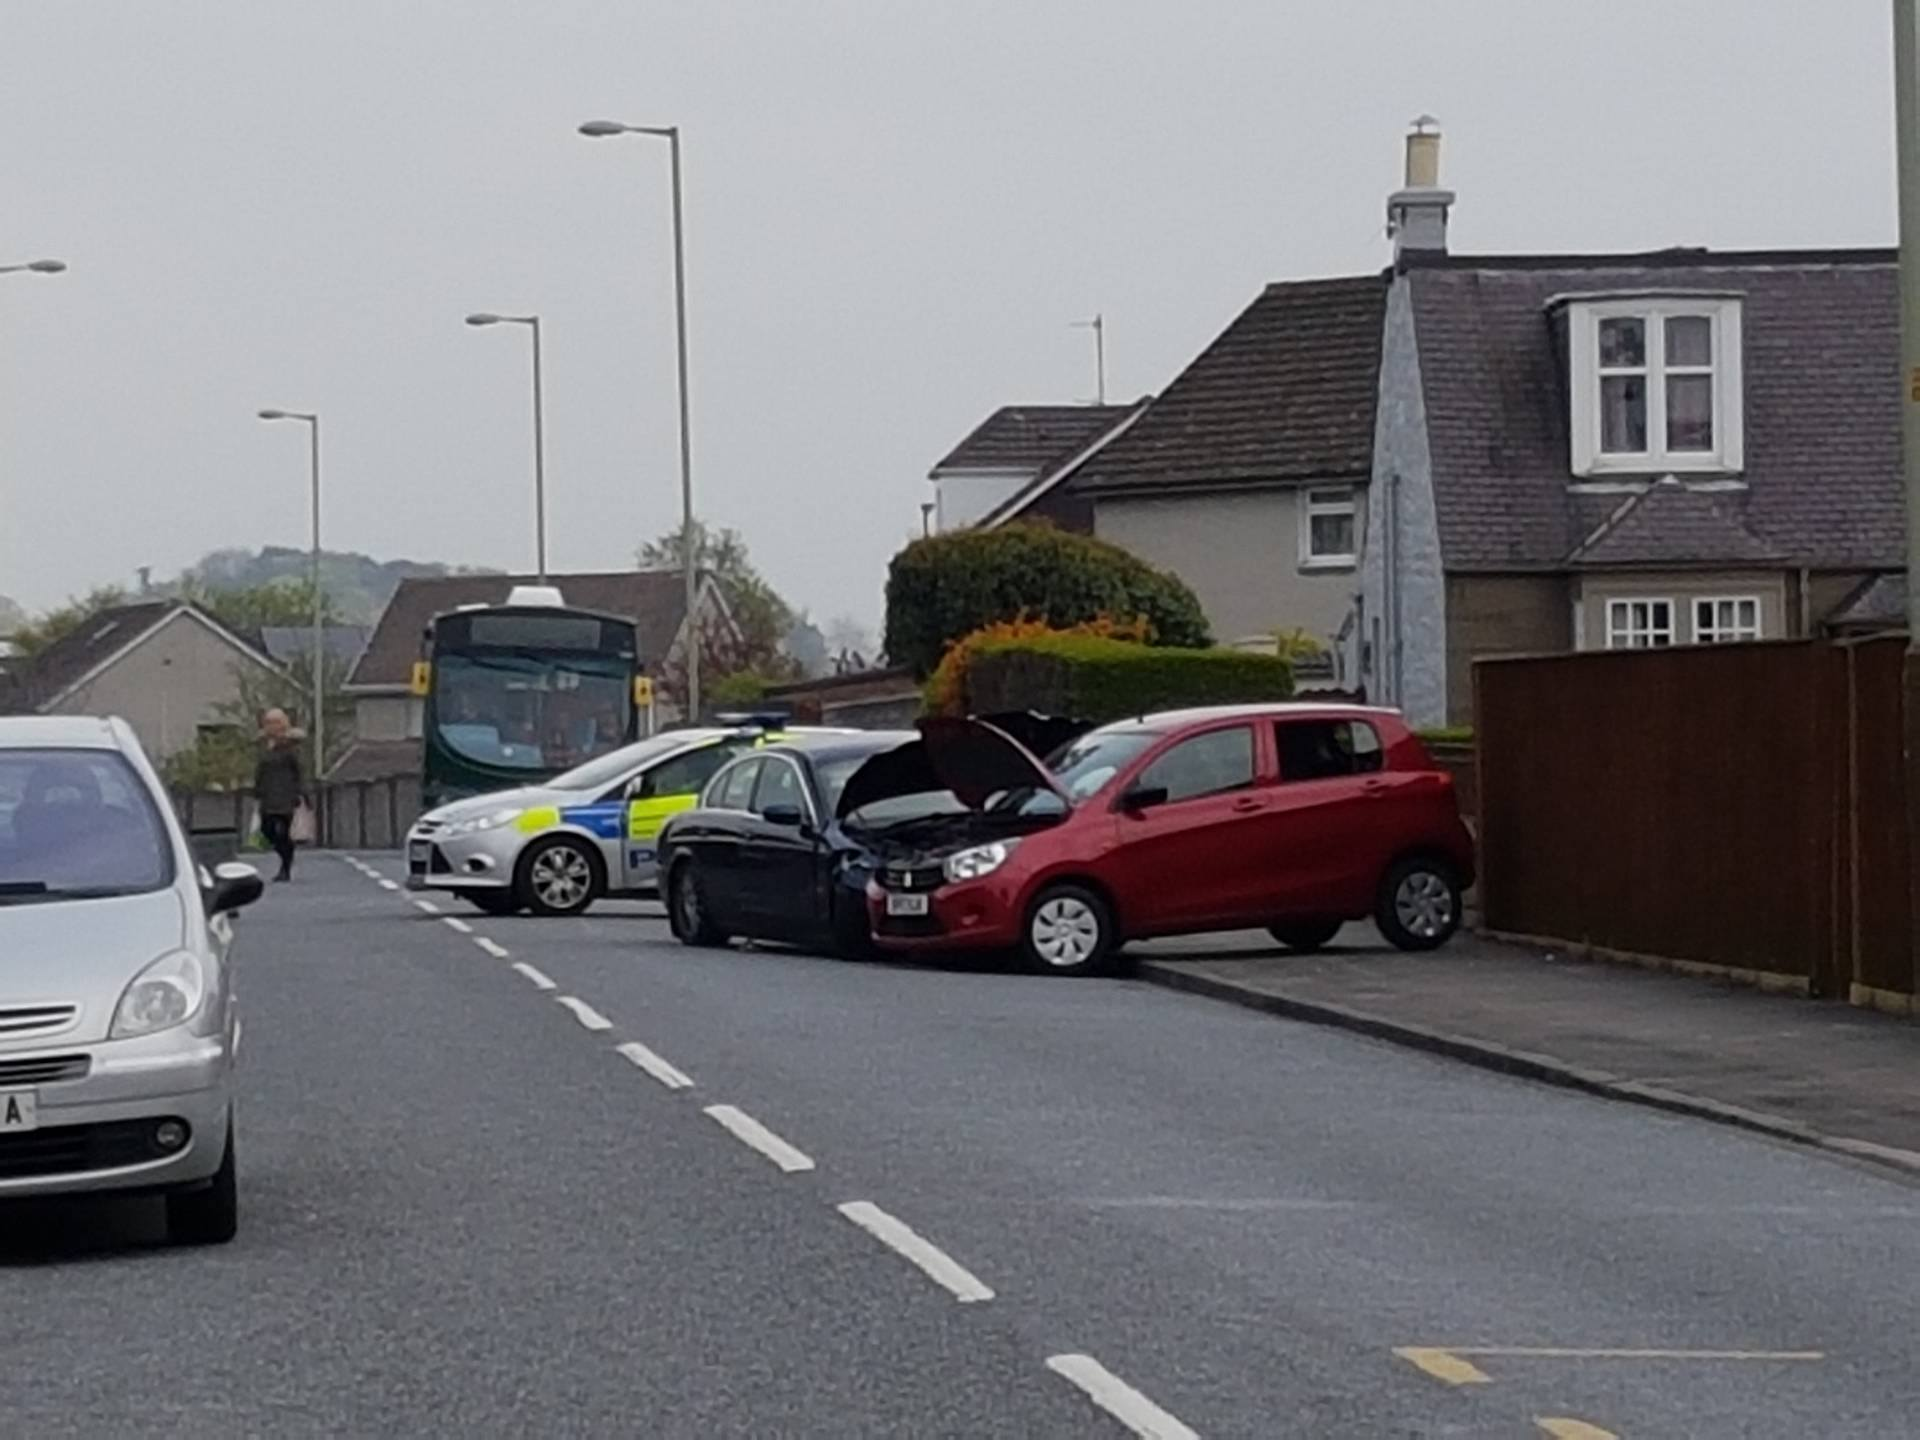 The scene of the crash on Strathmore Street